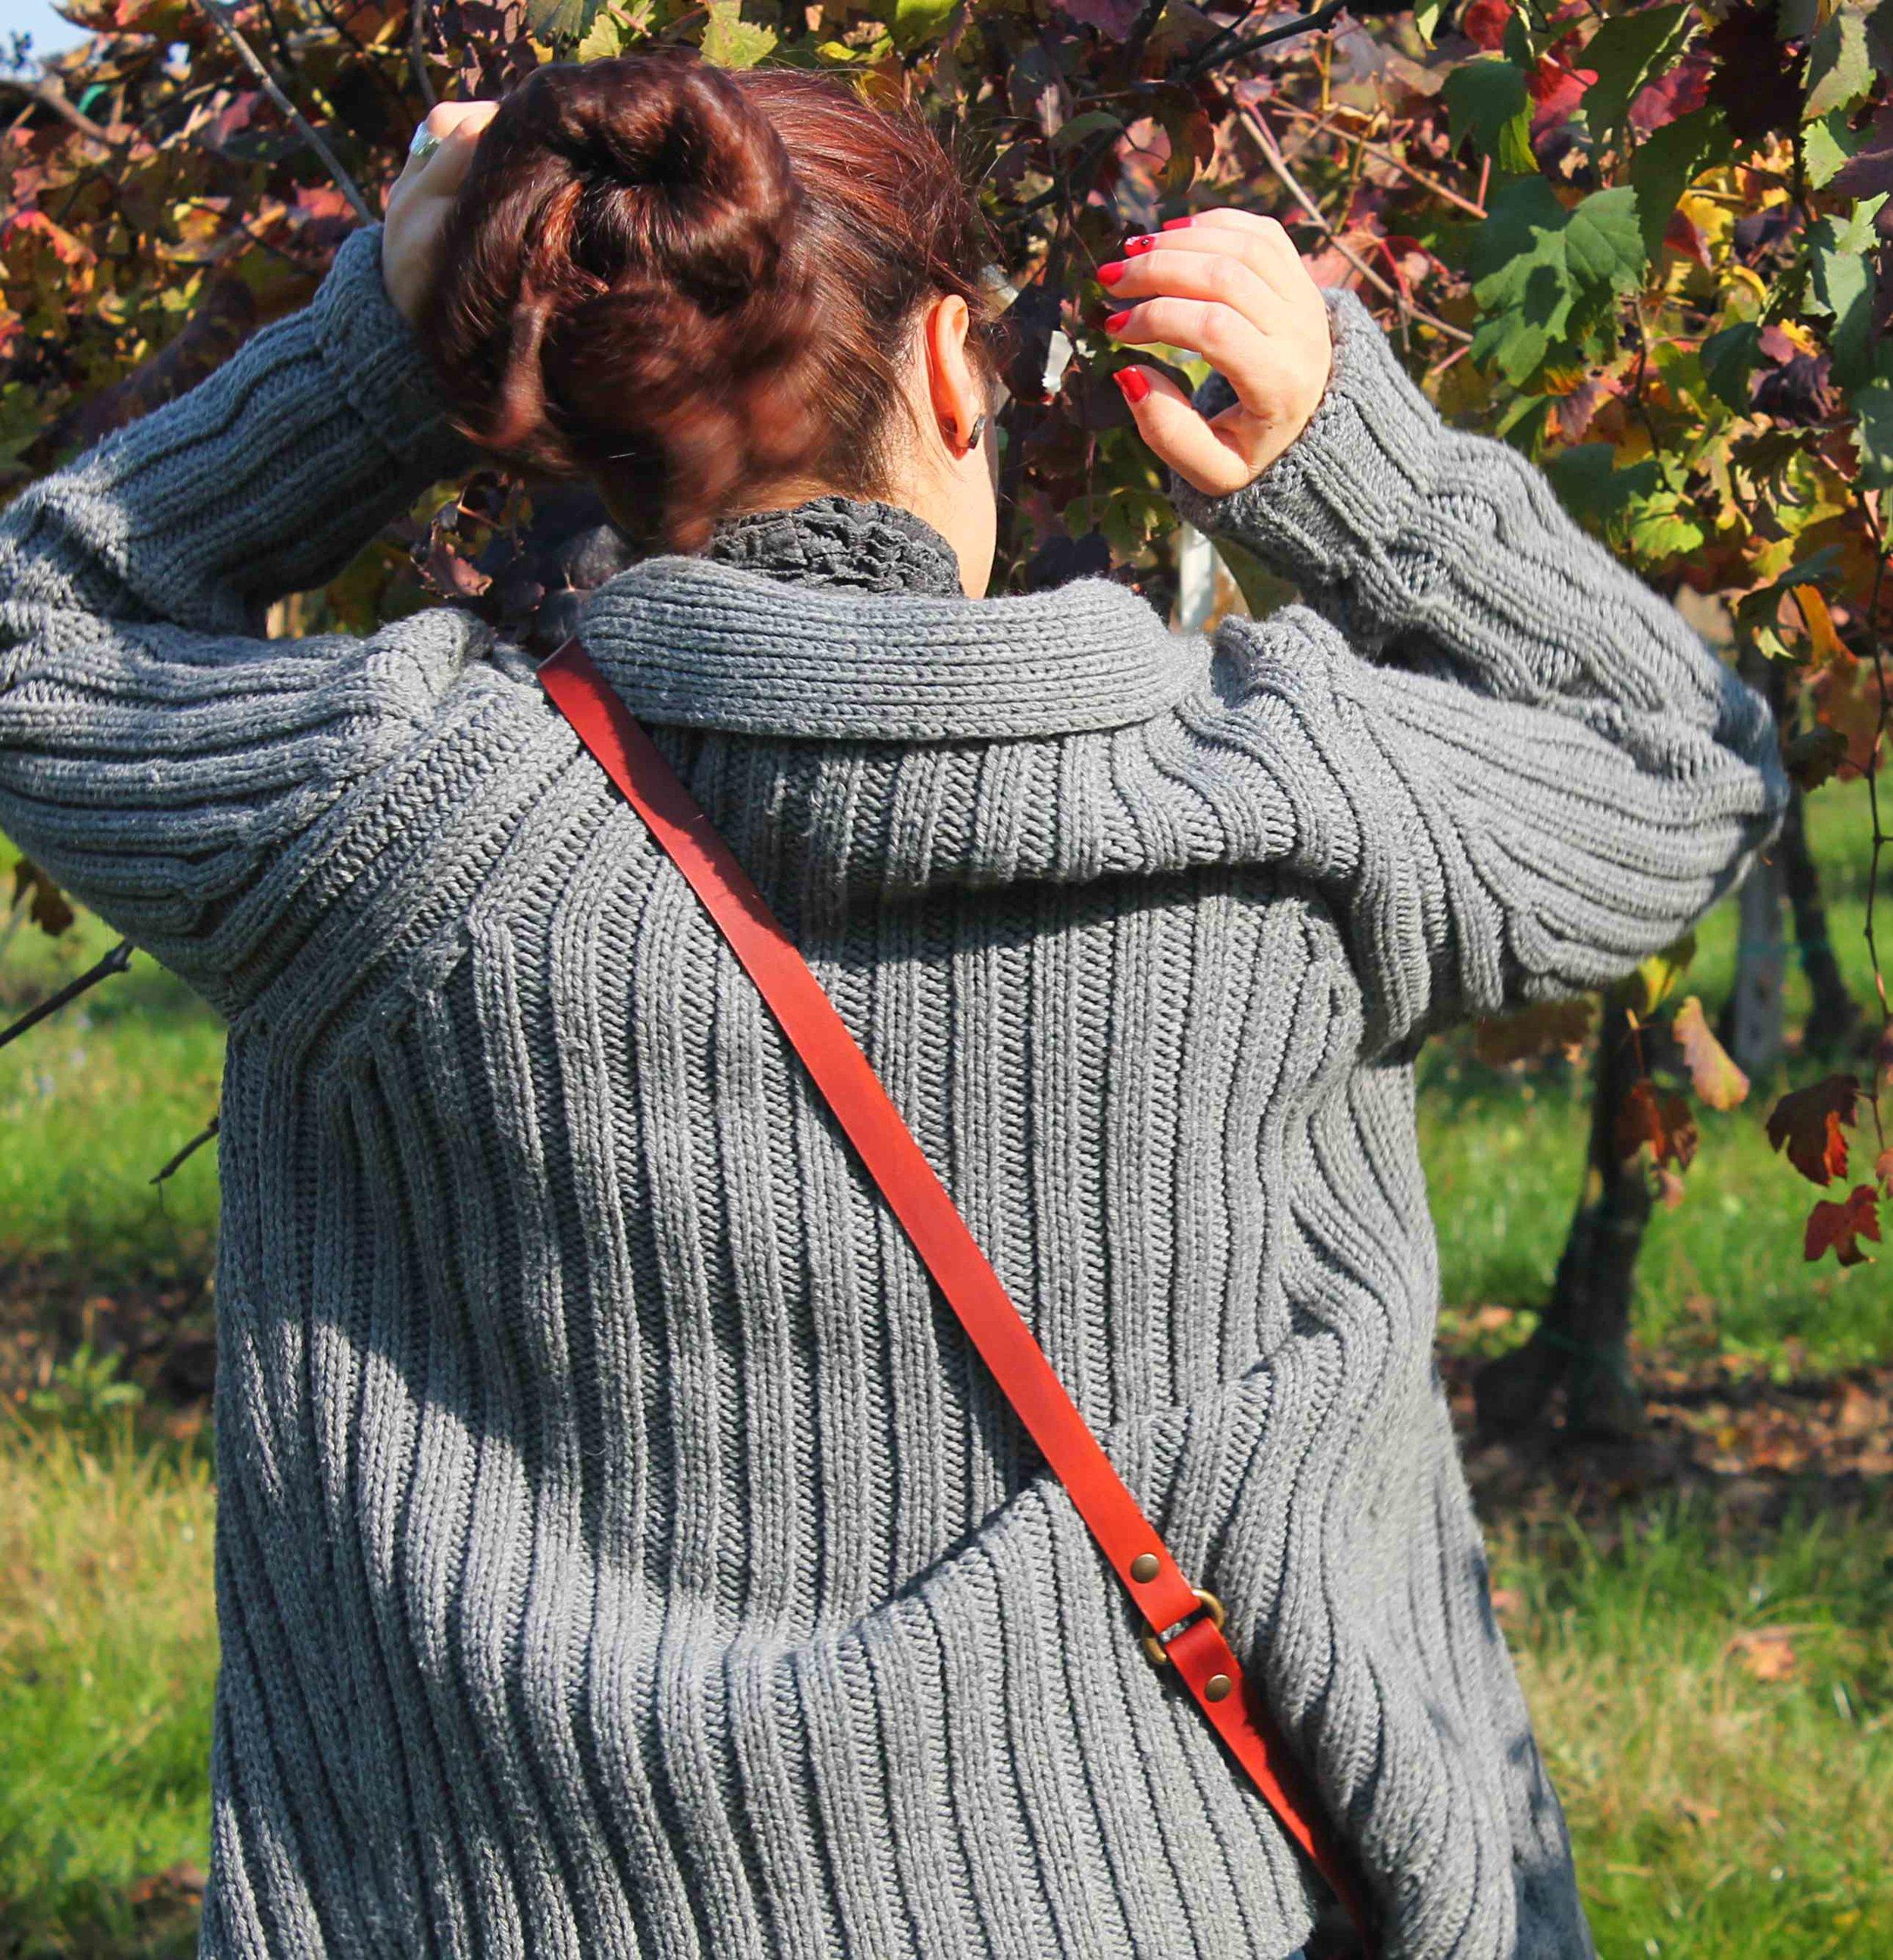 Autunno 5 #statusquoio #cuoio #bag #vigna #autumn #wave.jpg